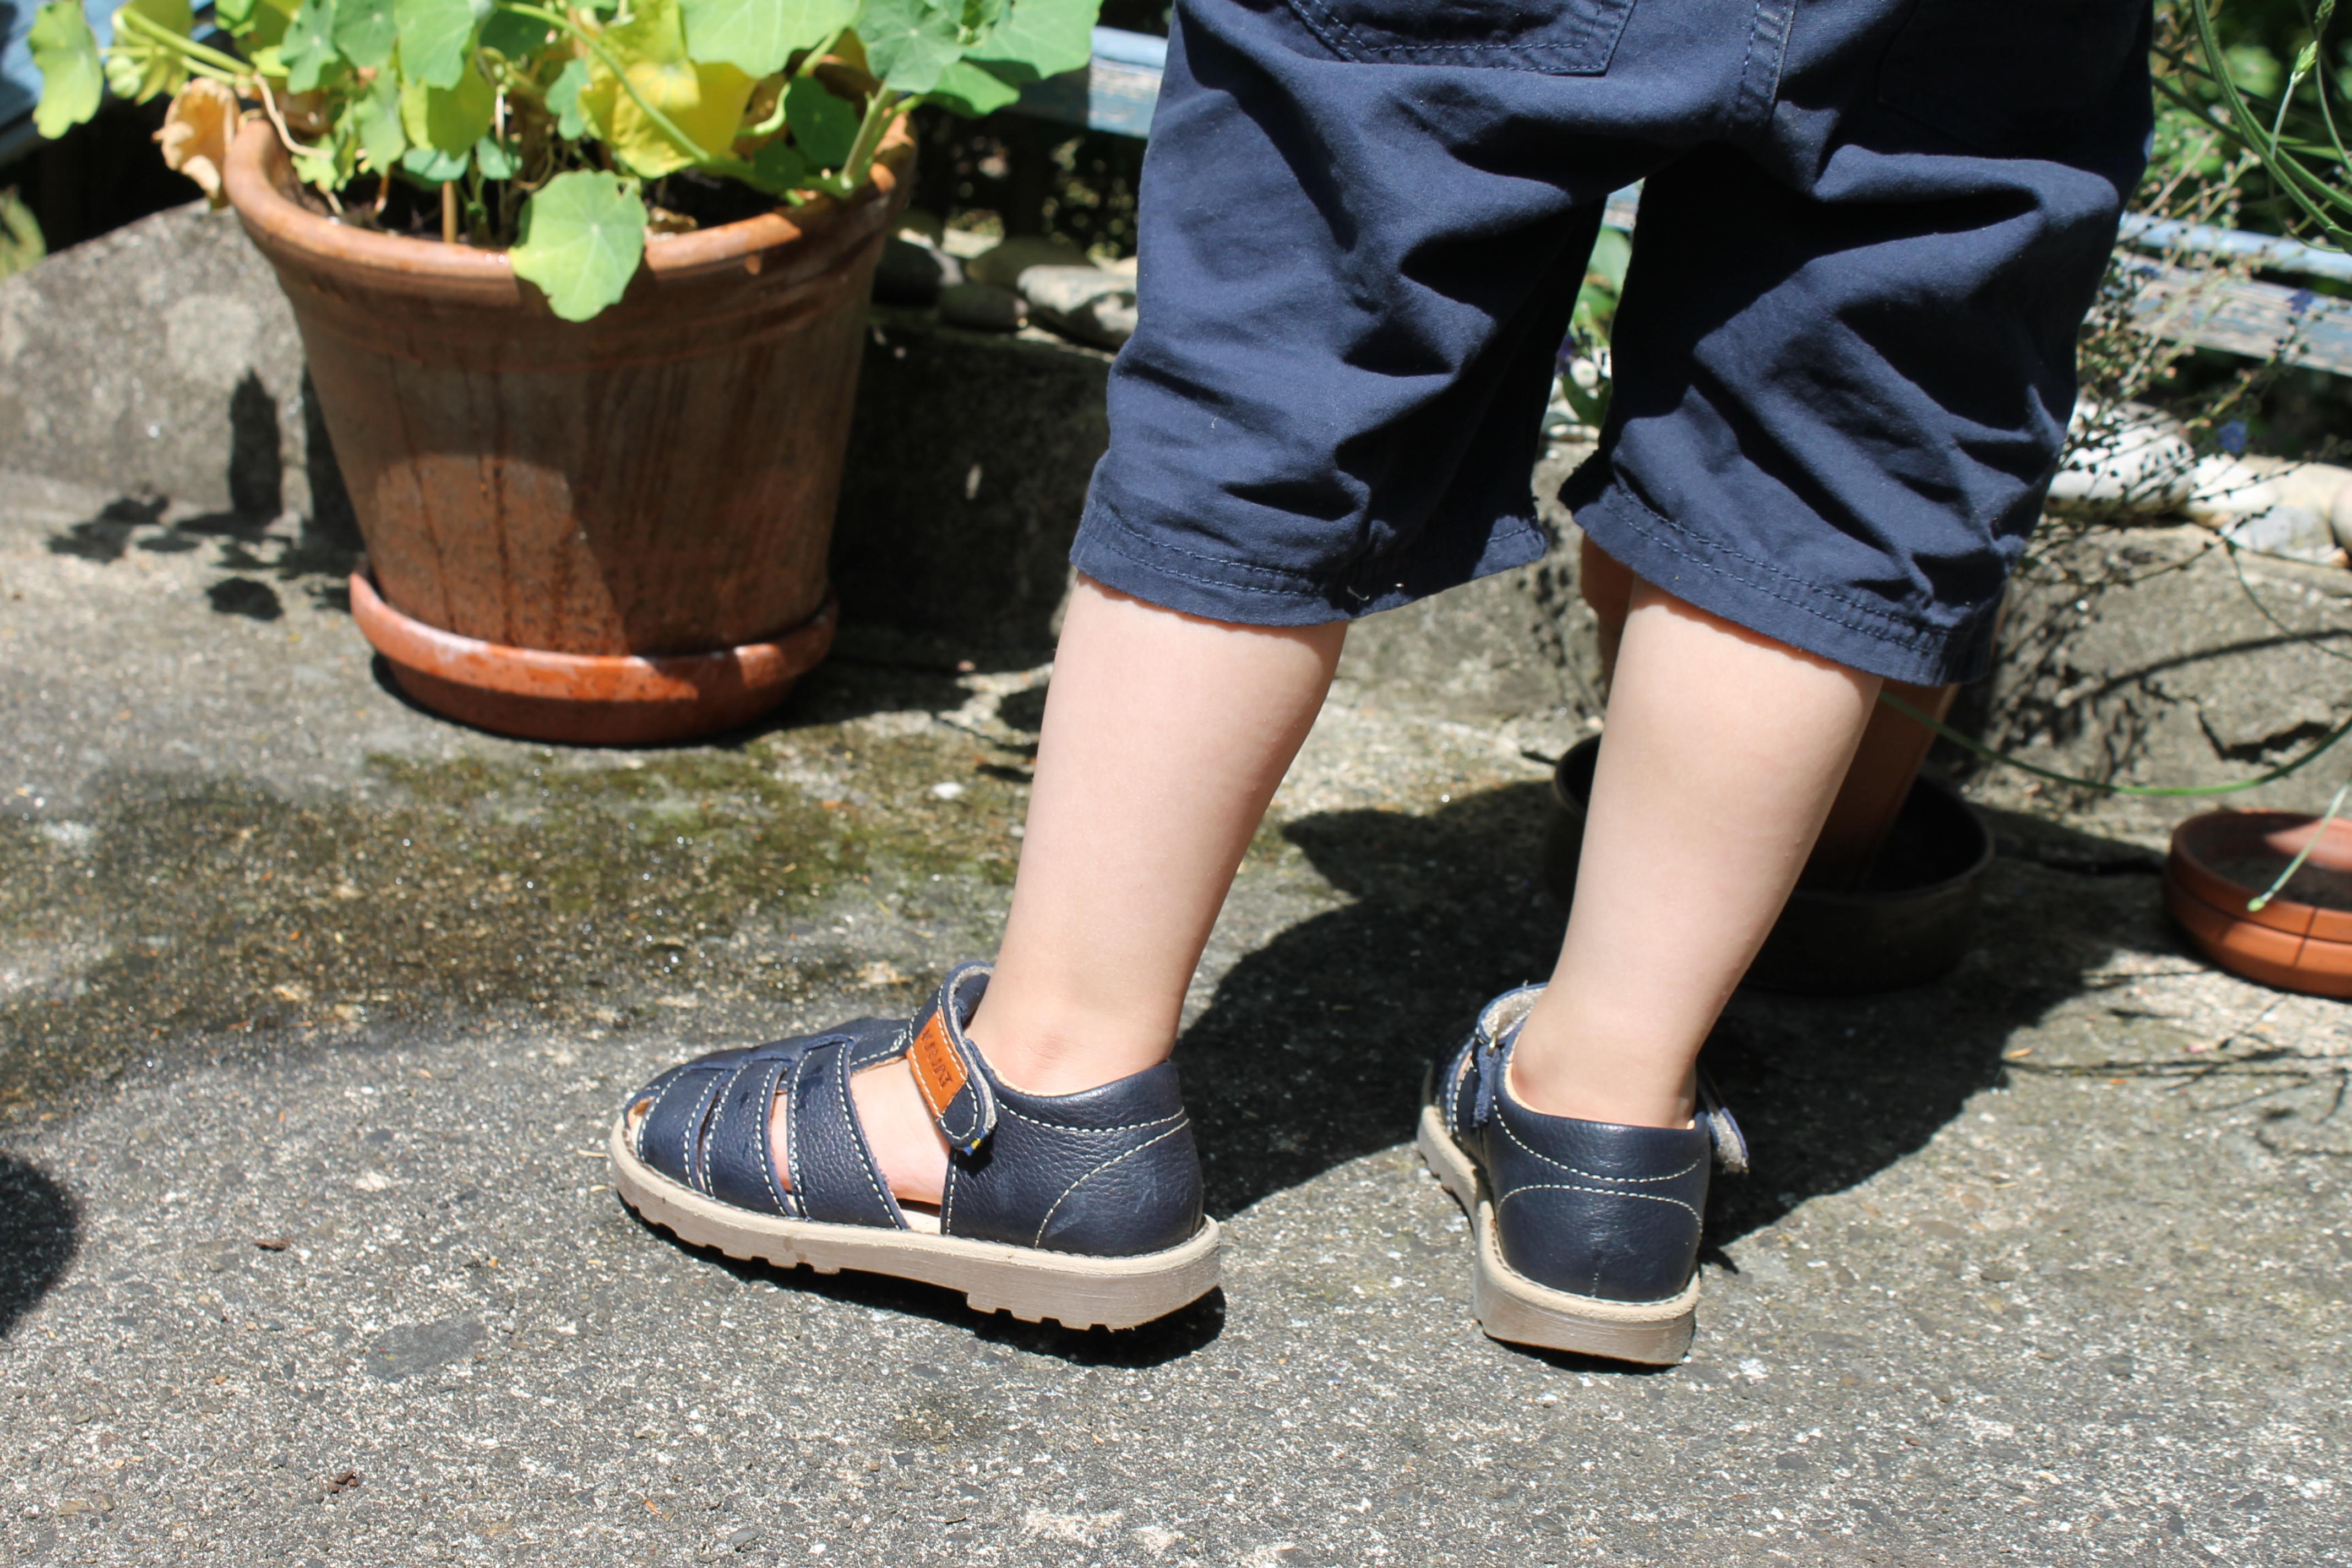 bereit f r den sommer kavat sandalen im alltagstest lavendelblog. Black Bedroom Furniture Sets. Home Design Ideas